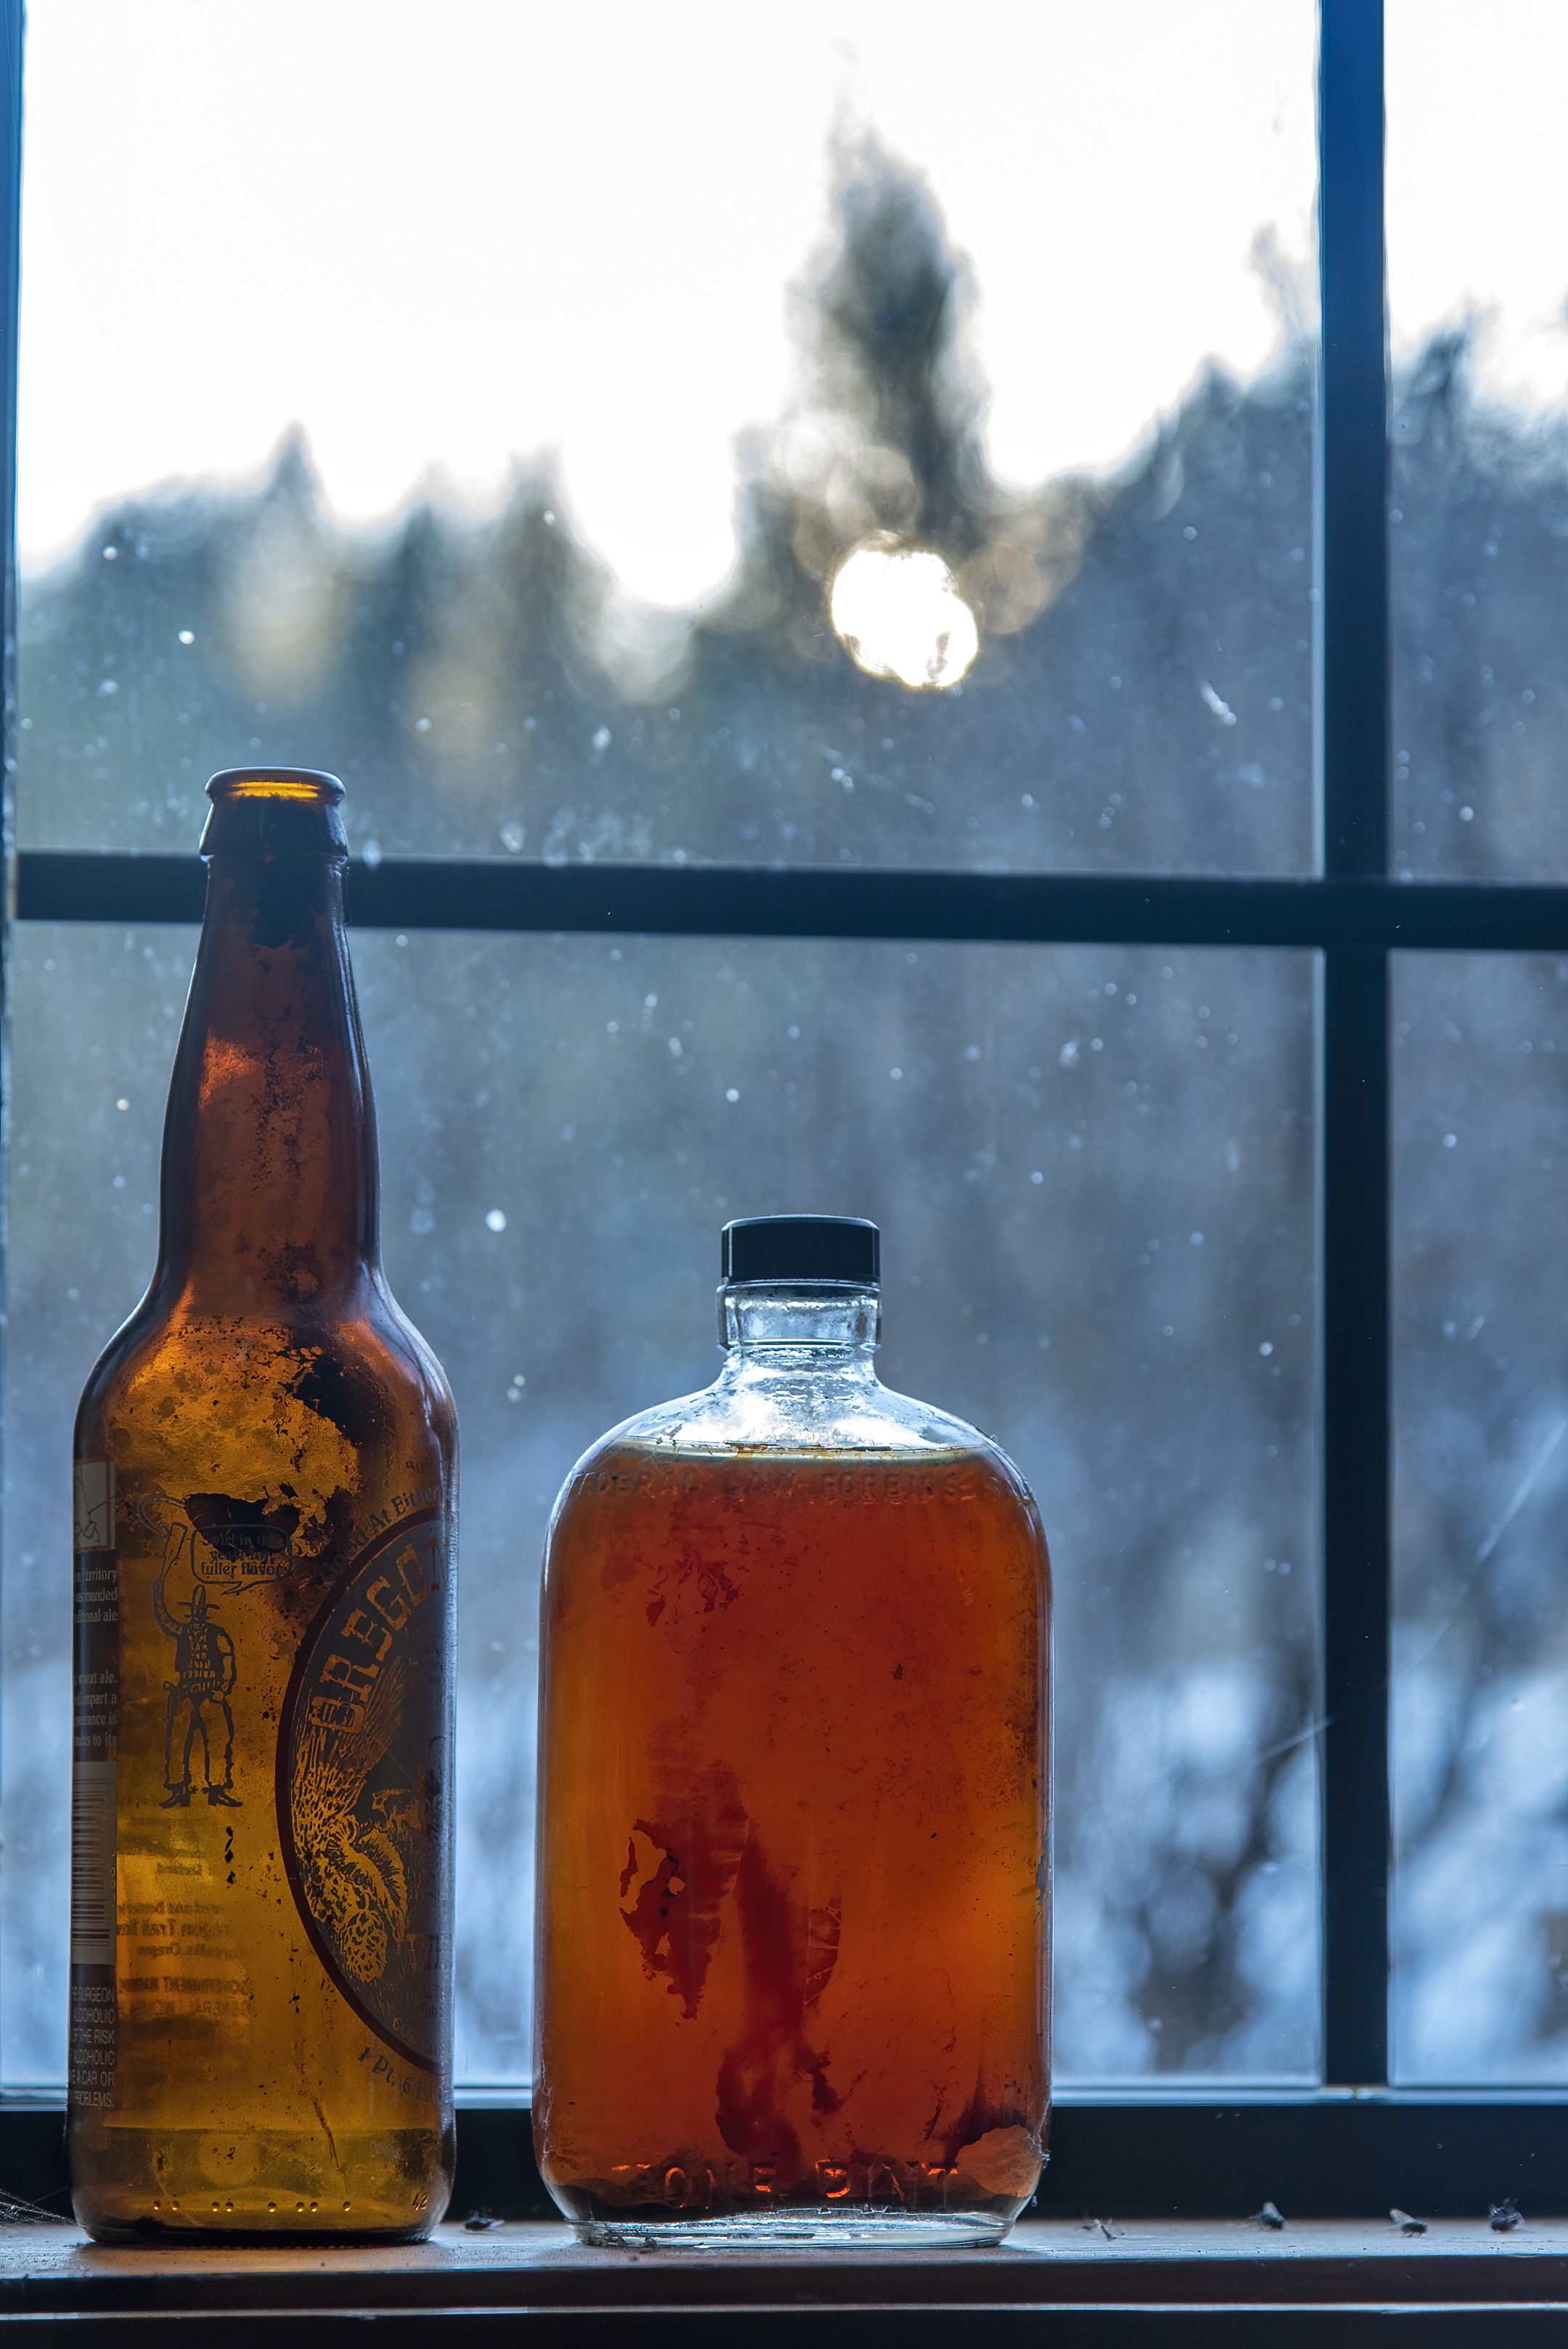 sycan ranch beatty bottles winter topaz denoise ai-denoise